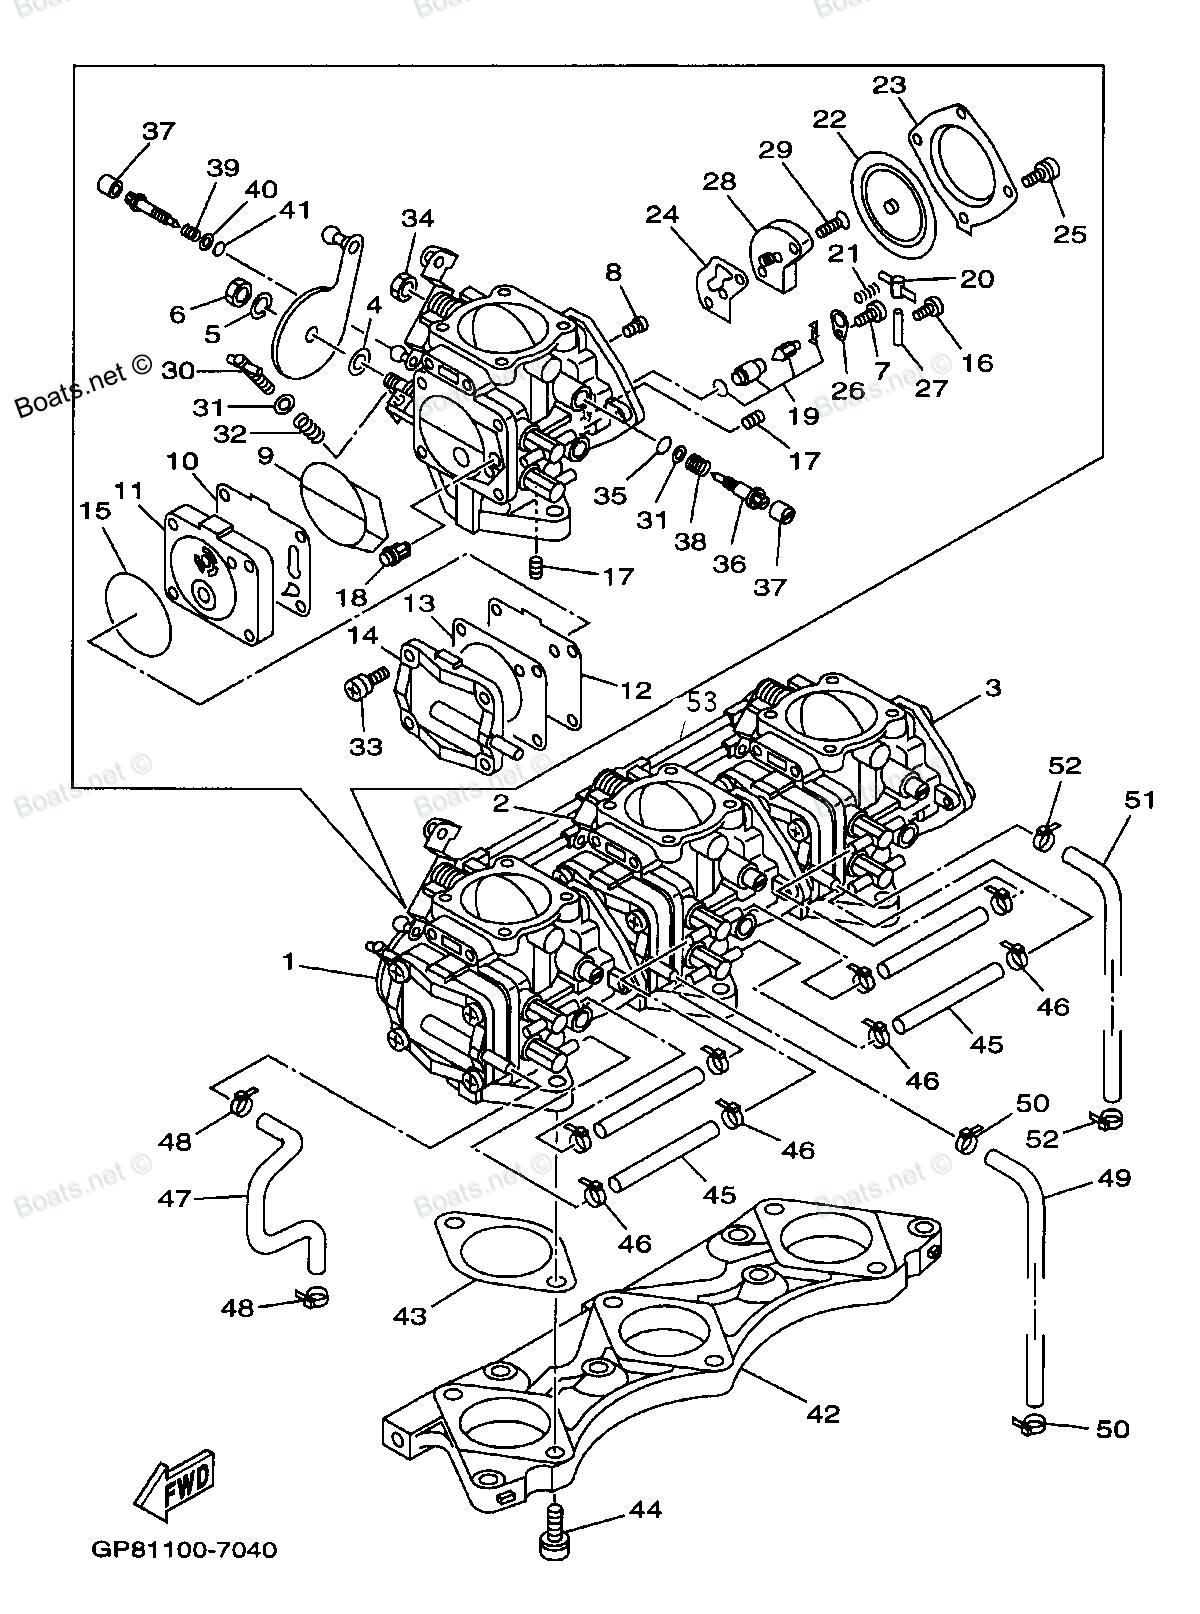 Waverunner Engine Diagram Wiring Yamaha Vx Diagramwaverunner Pontoon Boat I Have 1997